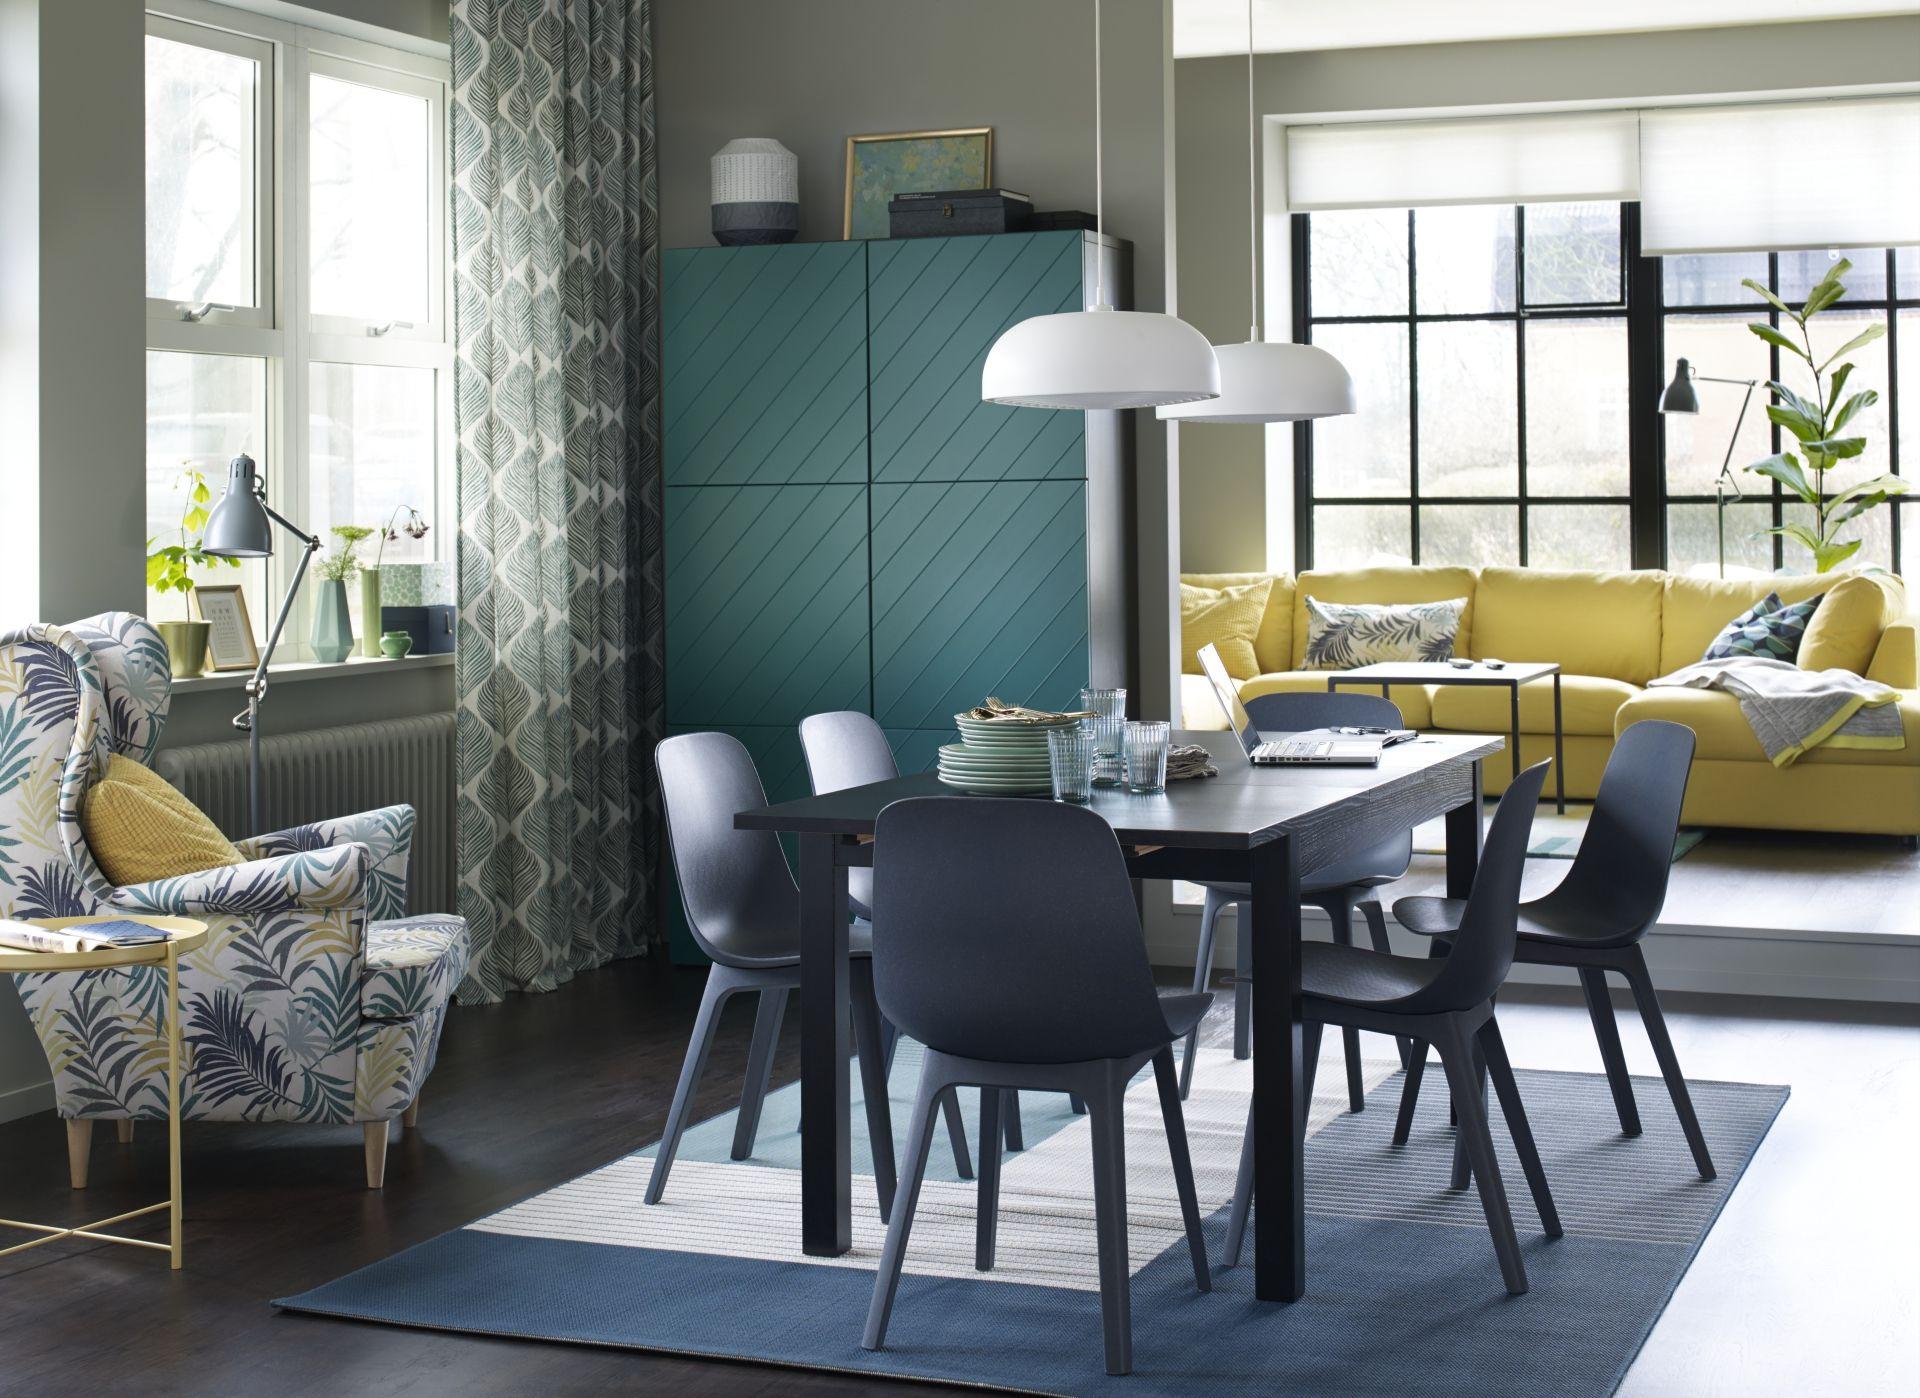 Odger eetkamerstoel blauw ikea hack ikea interior and for Eetkamer stoel